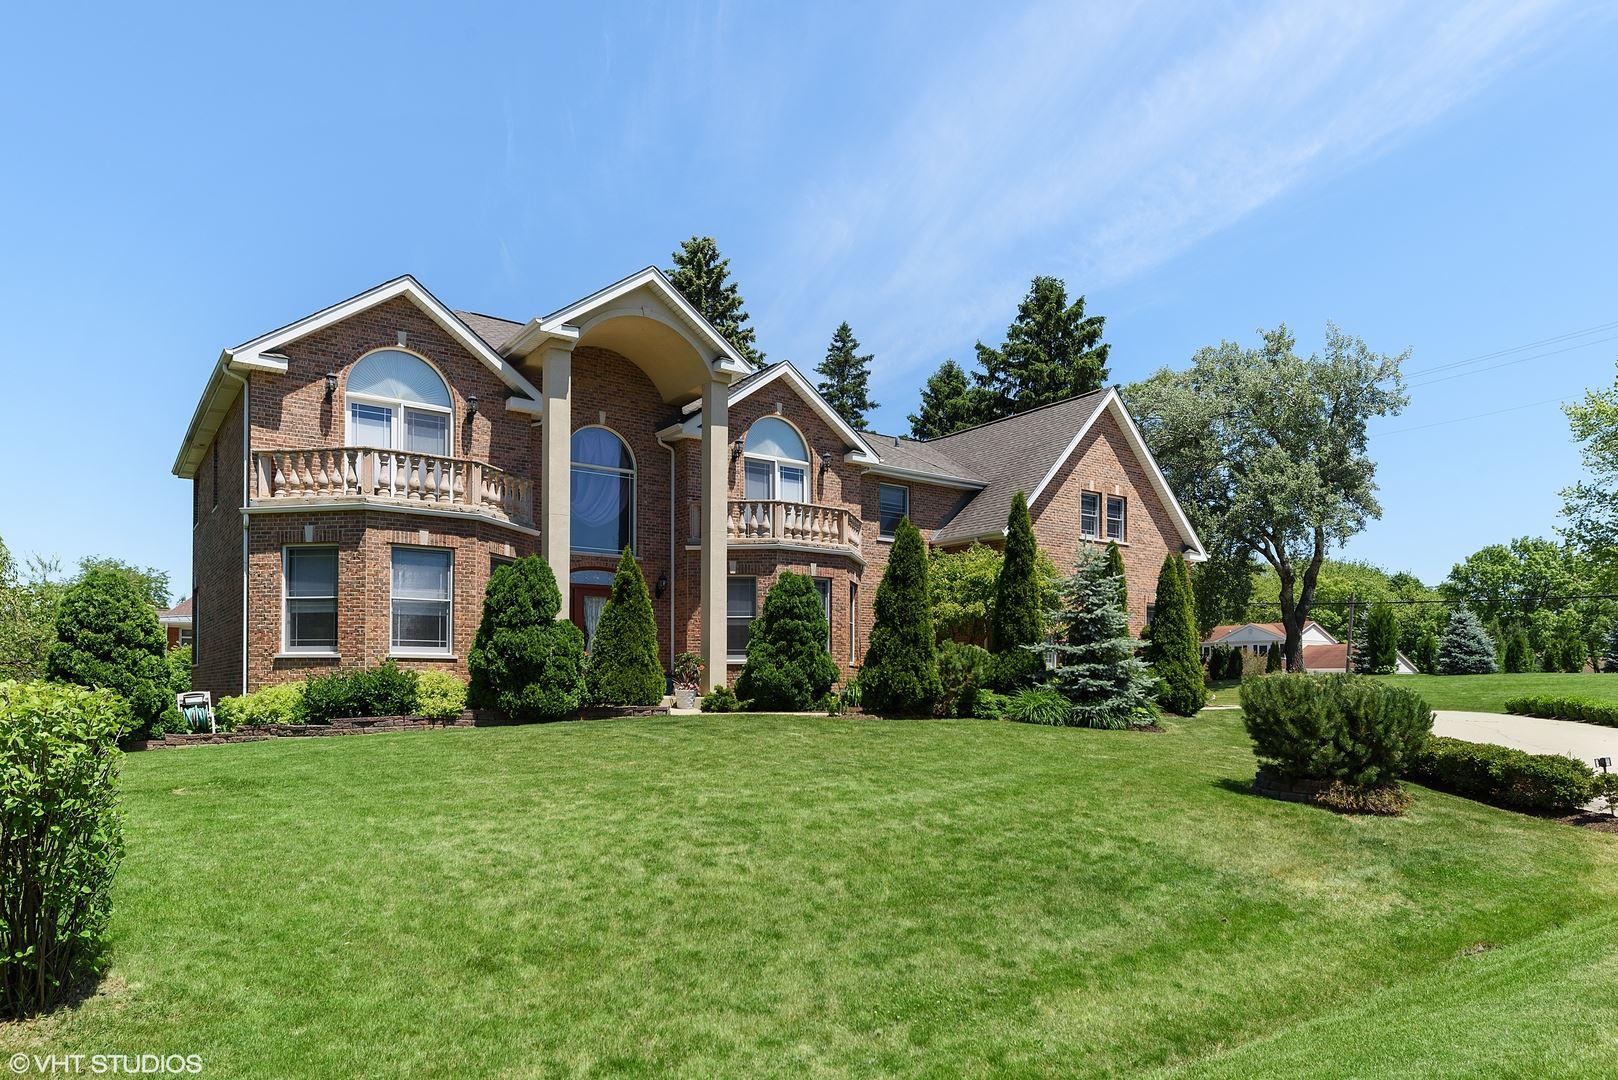 400 W Olive Street, Prospect Heights, IL 60070 - #: 10731414